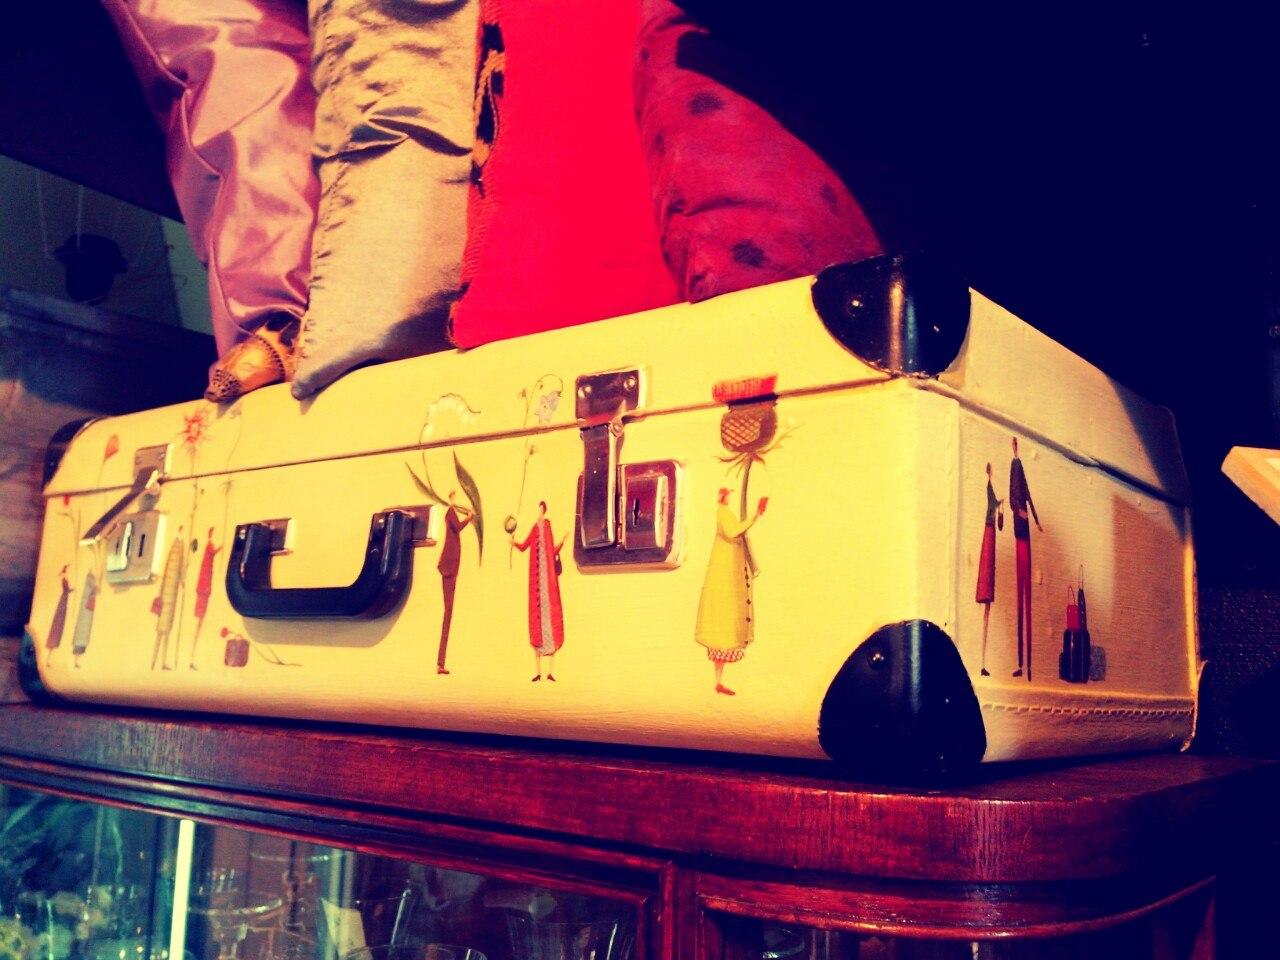 дизайнерский чемодан